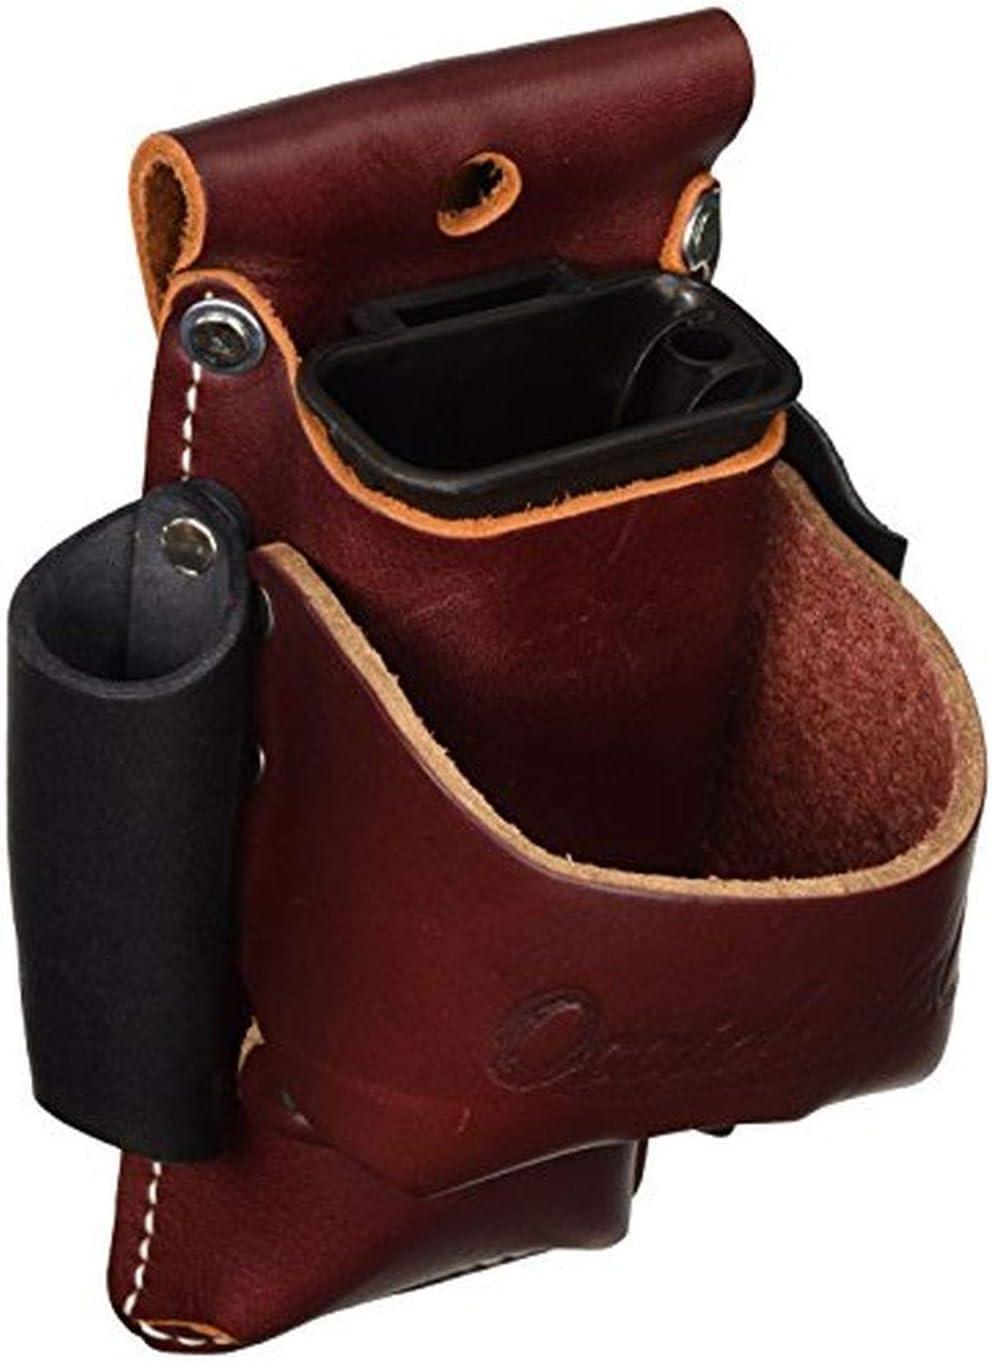 Occidental Leather 5522 Belt Worn 4 in 1 Tool Tape Holder